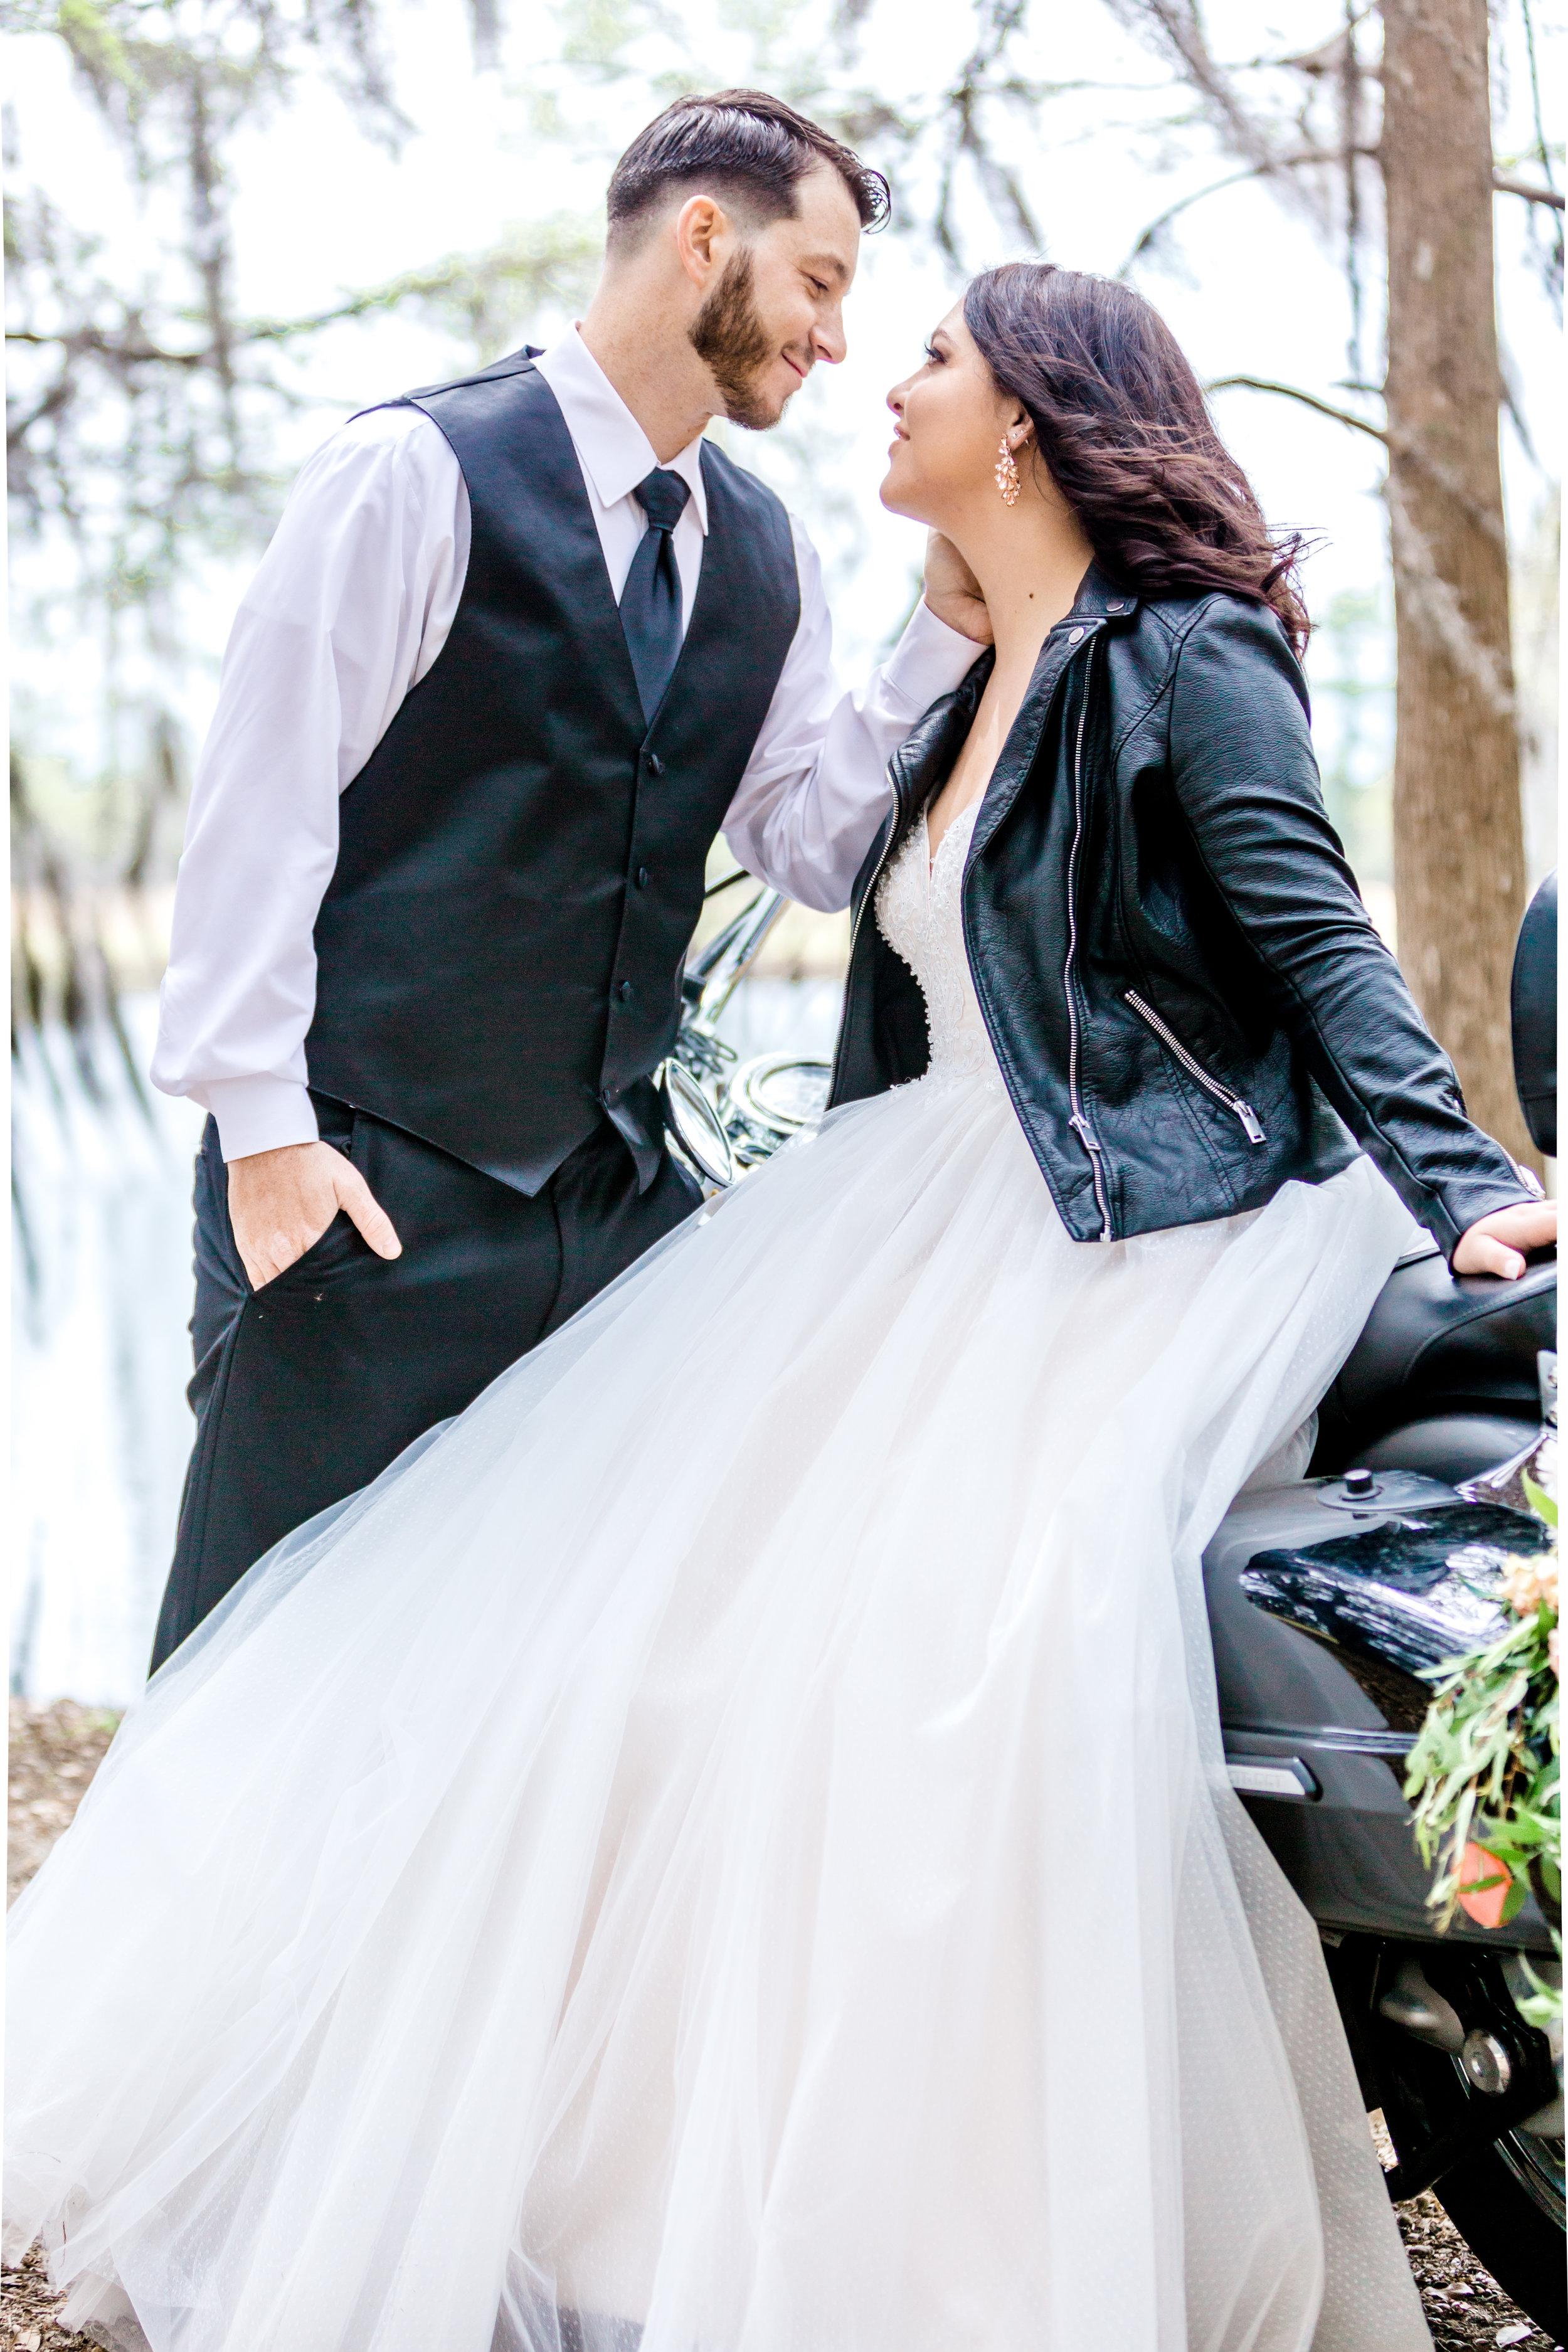 Motorcycle and Leather Jacket Wedding Bride.jpg